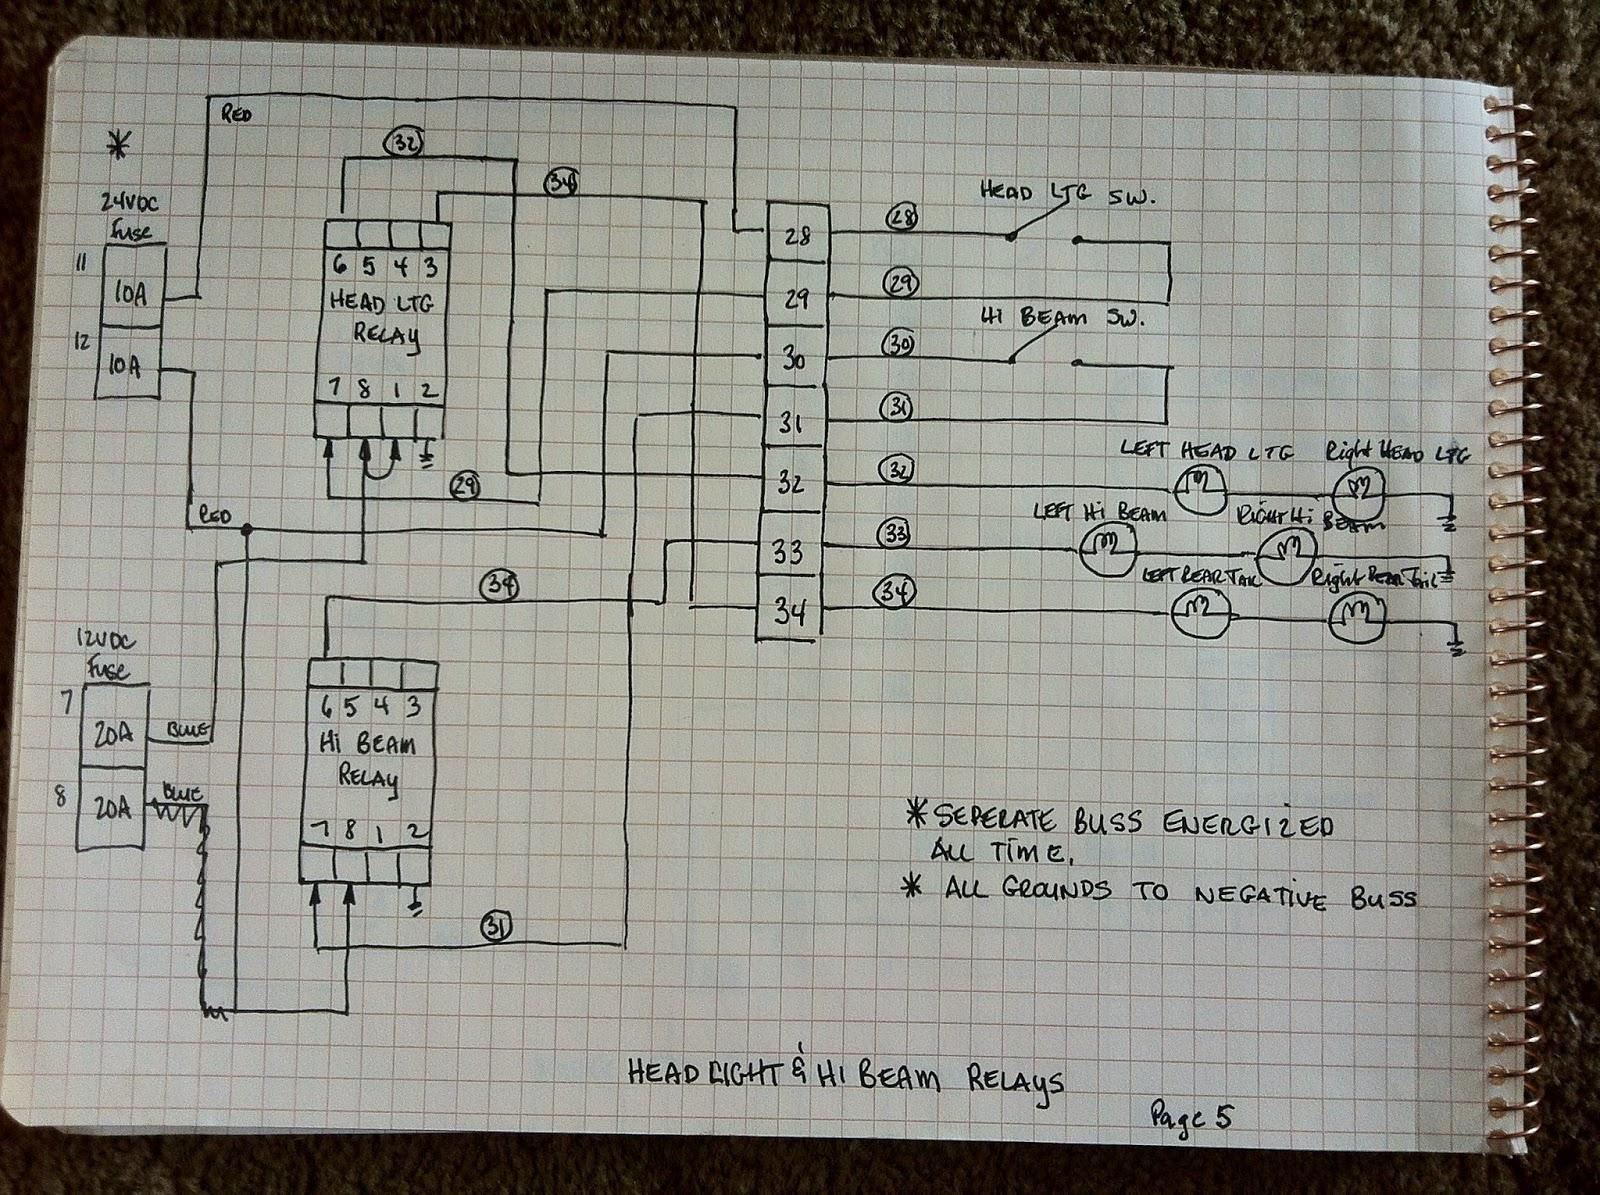 medium resolution of prevost car wiring schematic wiring diagram blog prevost car wiring schematic